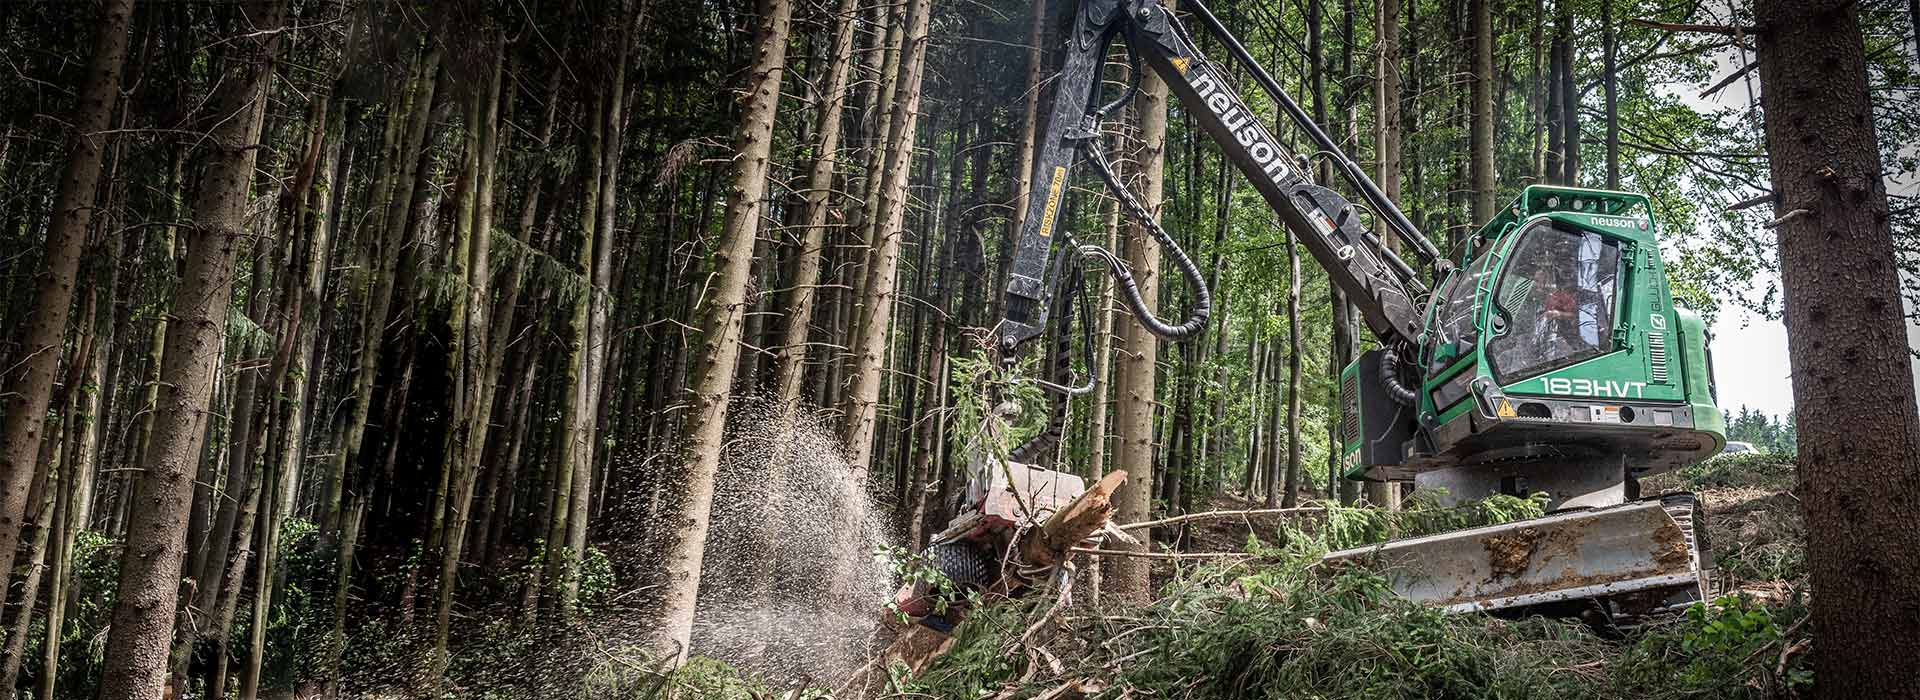 holzernte - Holzschlägerungsunternehmen Salzburg Glück Forstservice - Holz Glück